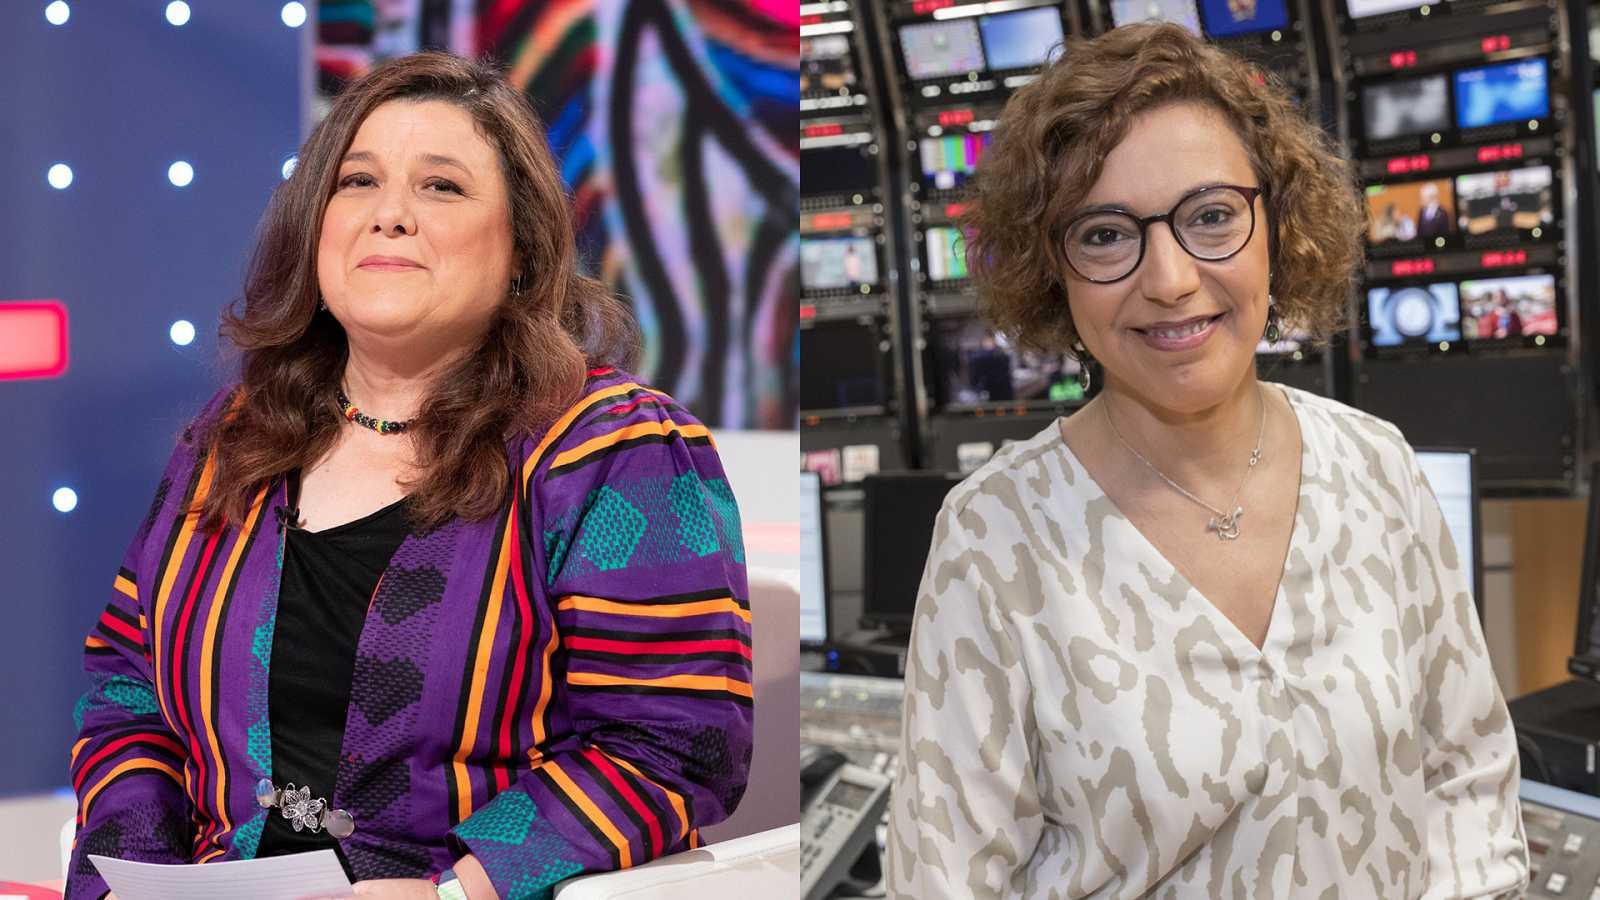 Pilar Requena y Carolina Pecharromán